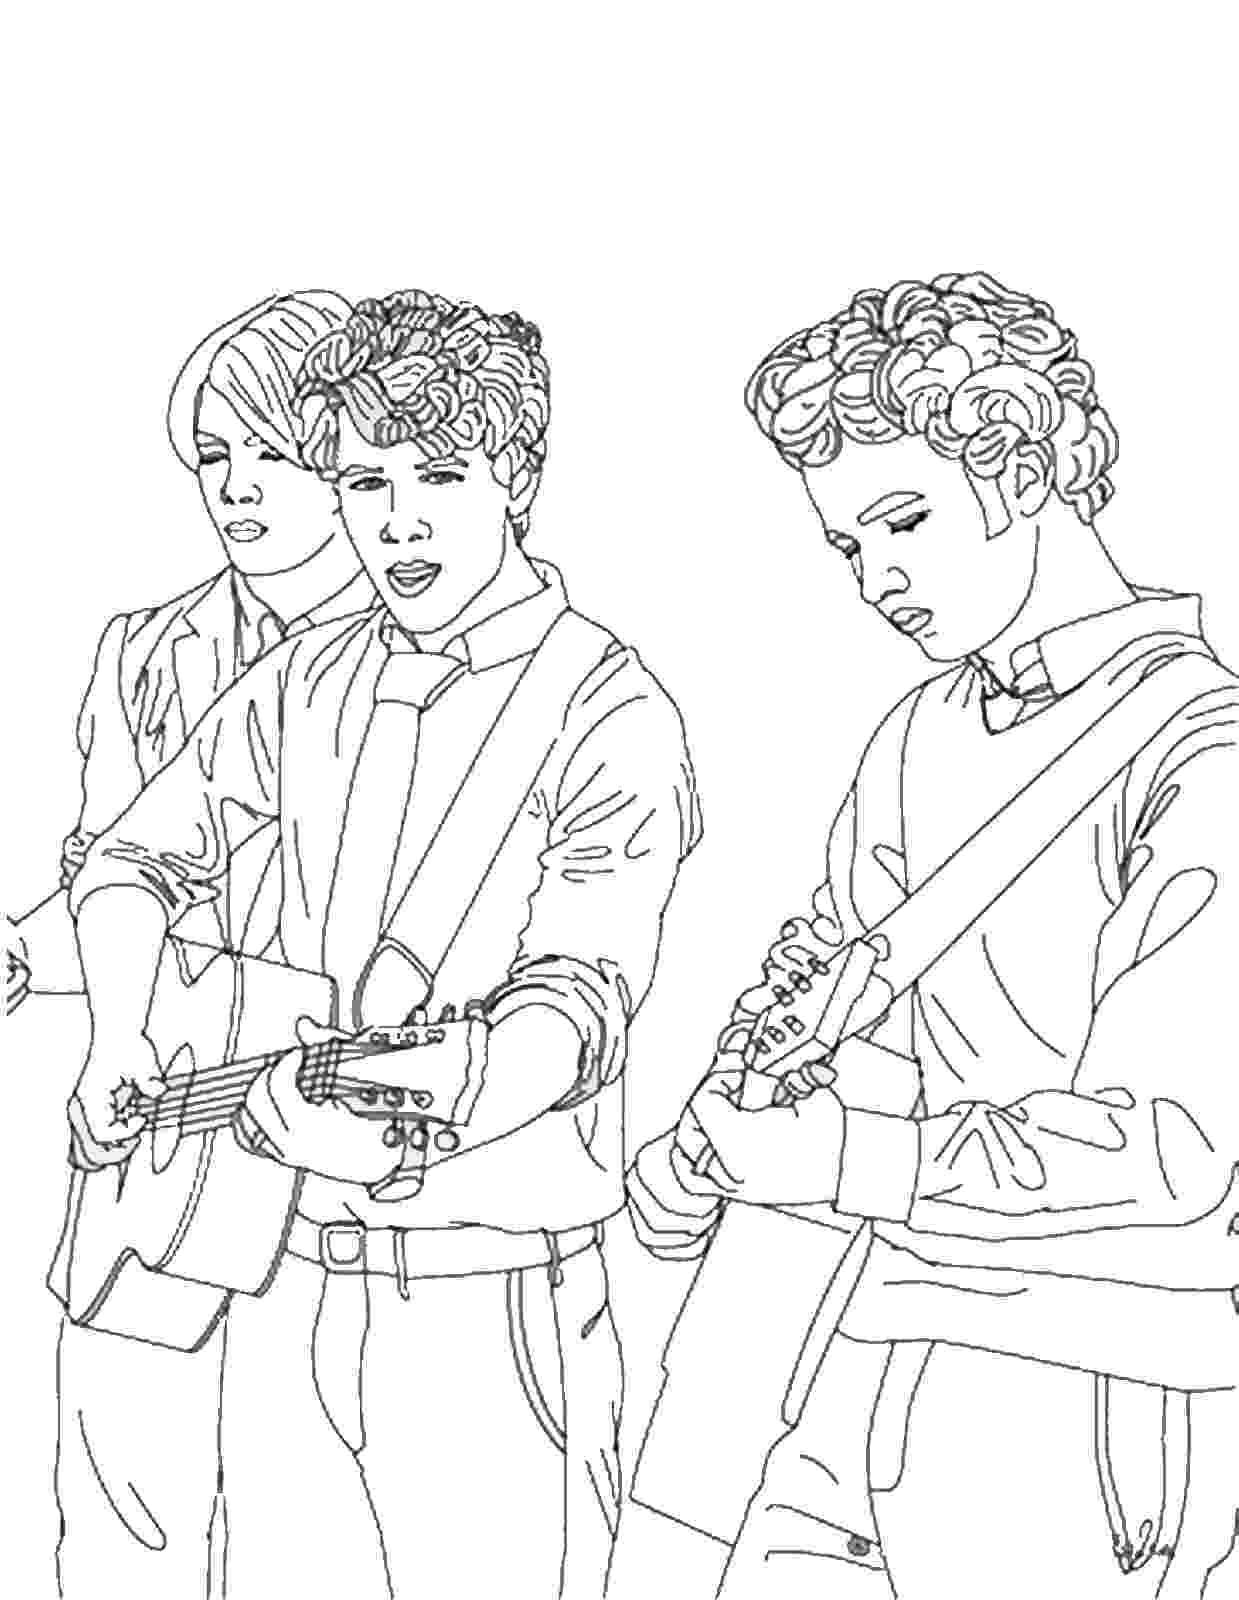 rock star coloring pages rock star coloring pages pages coloring rock star